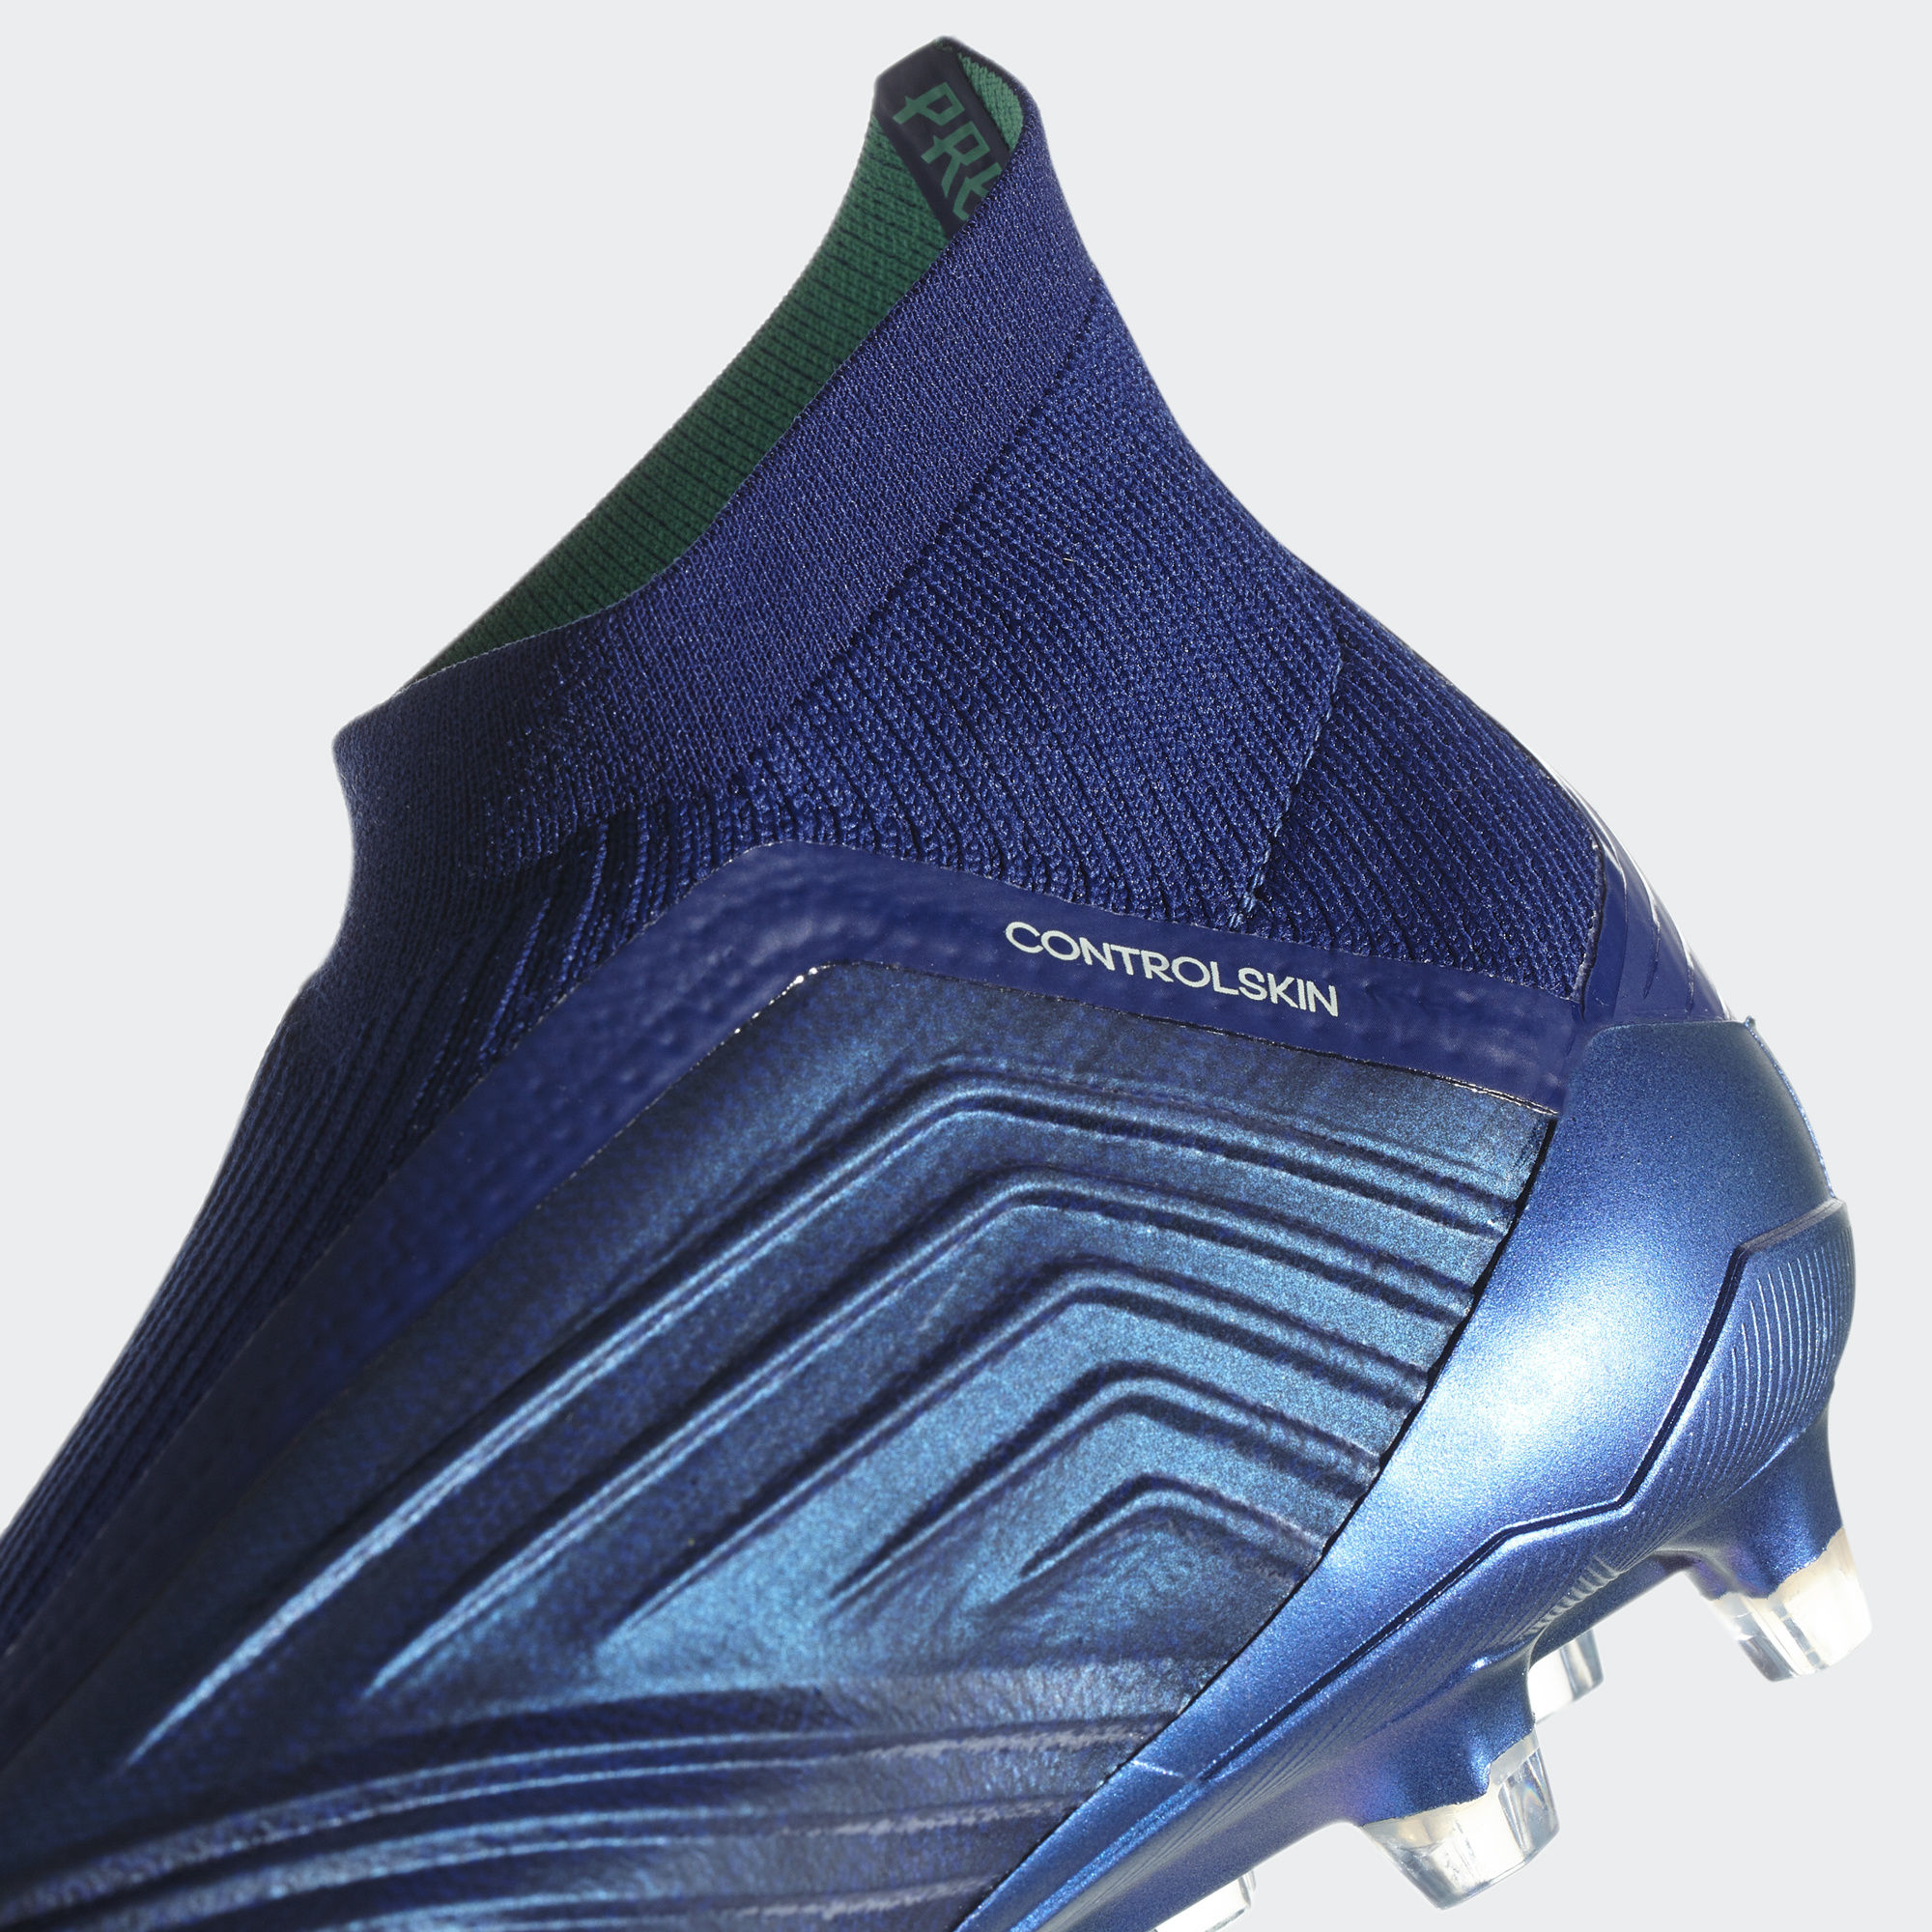 52b1421e528a Футбольные бутсы Predator 18+ FG M CM7394 adidas Performance ...